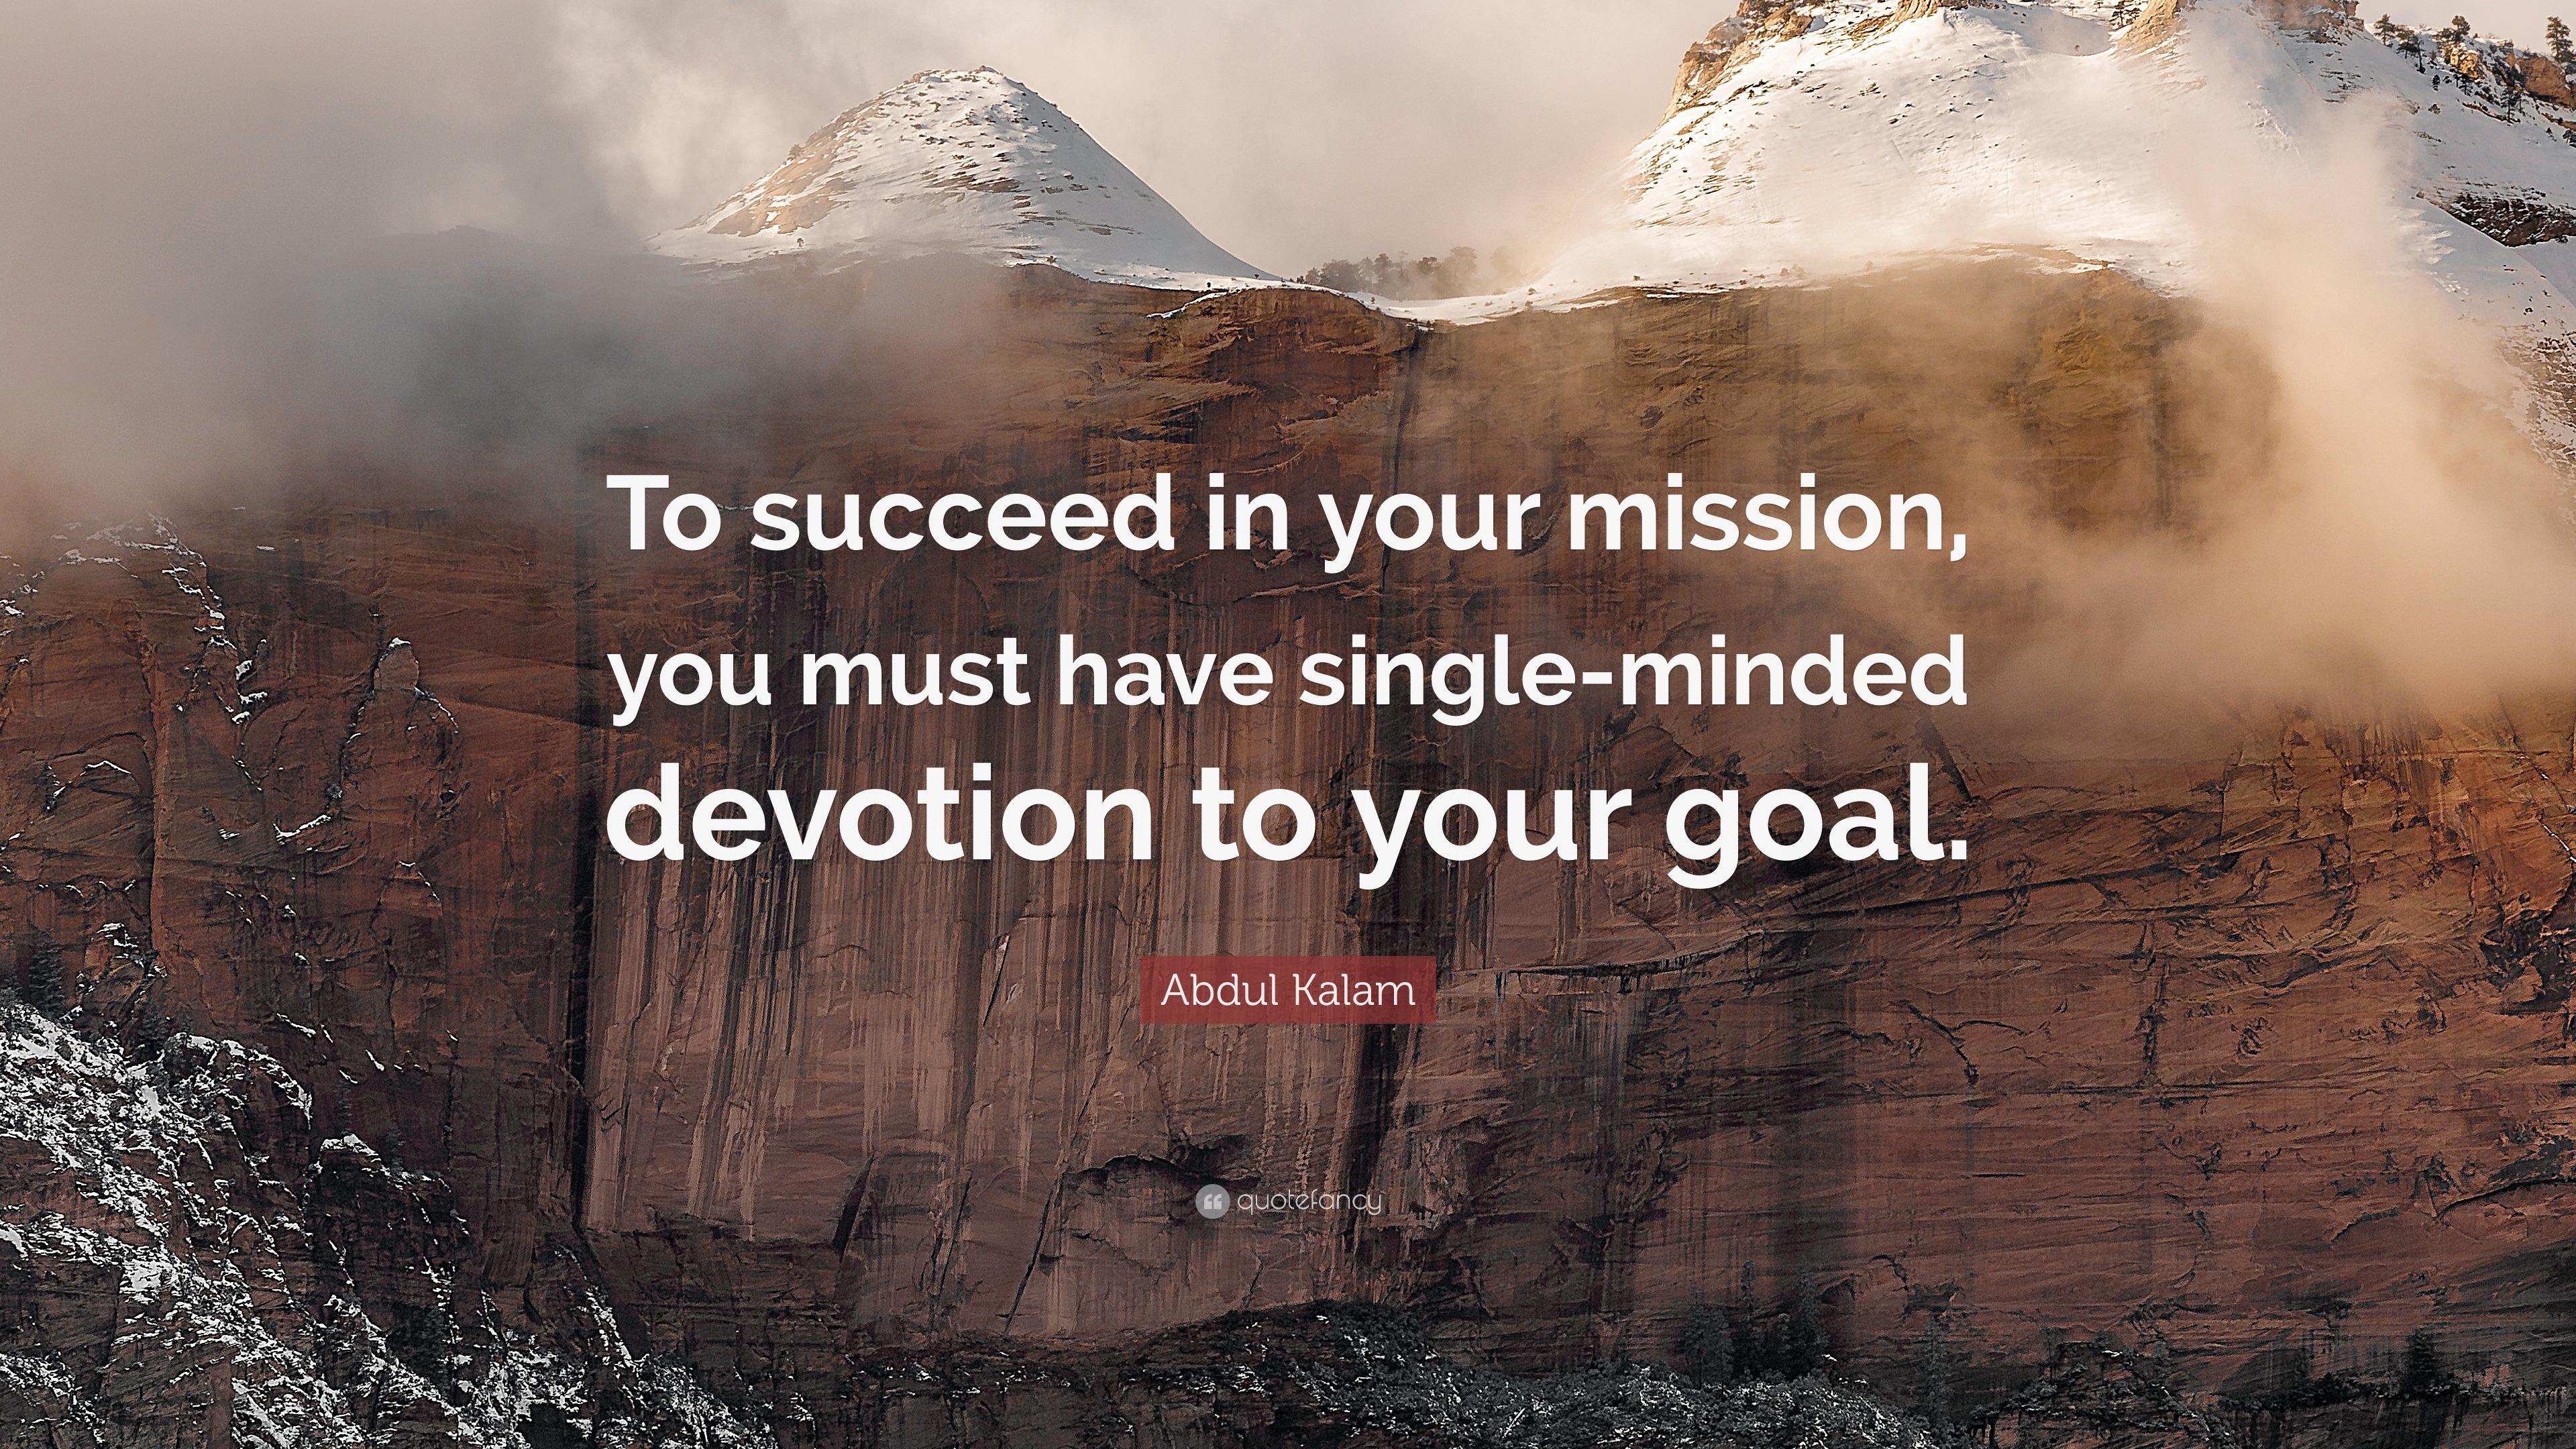 Single minded devotion means